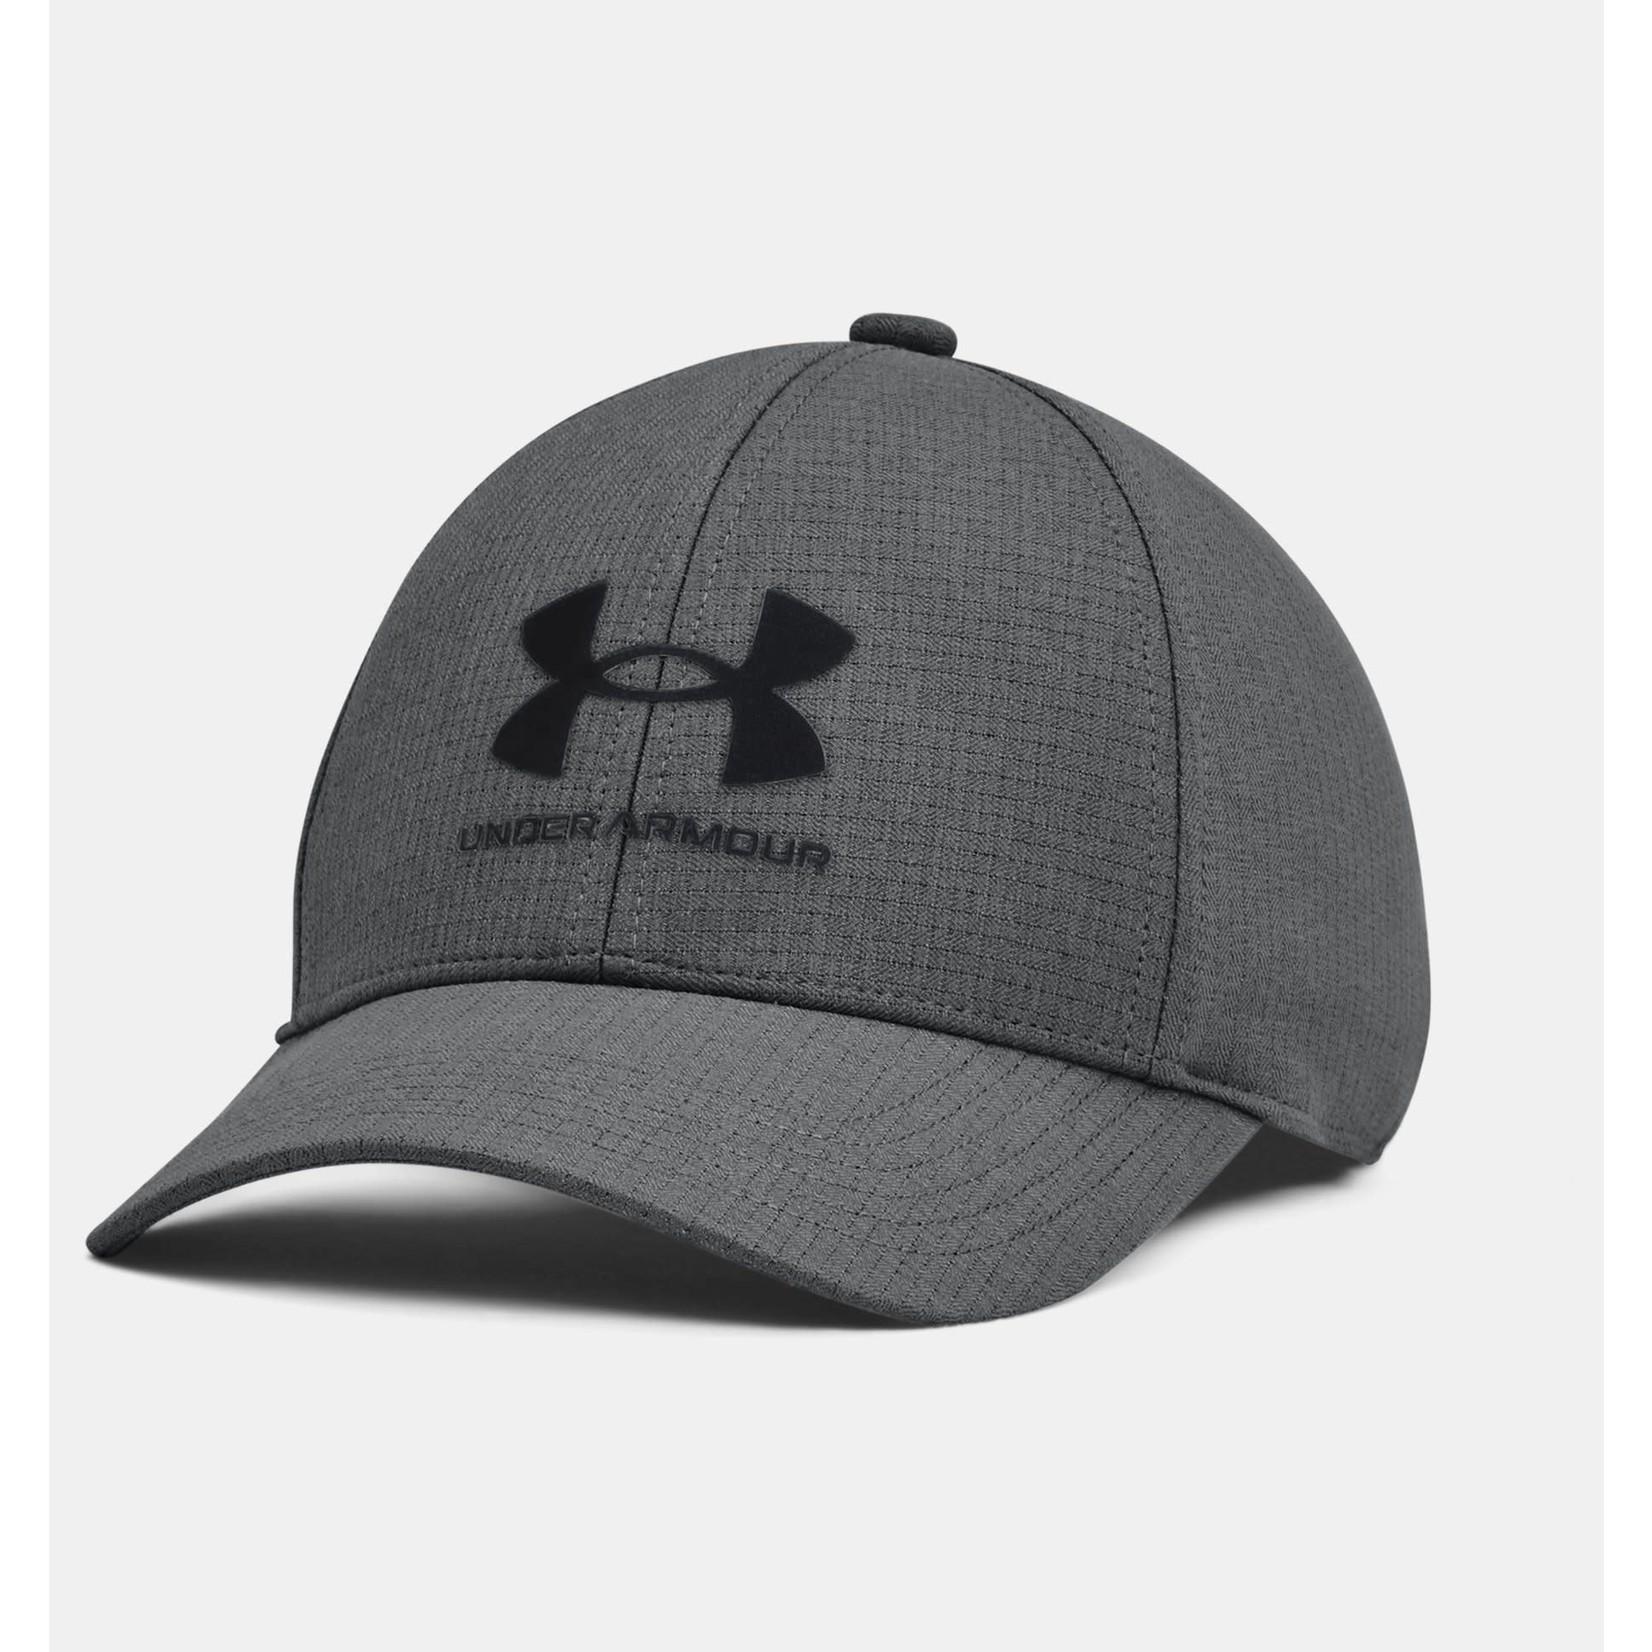 Under Armour Under Armour Hat, ArmourVent Stretch, Boys